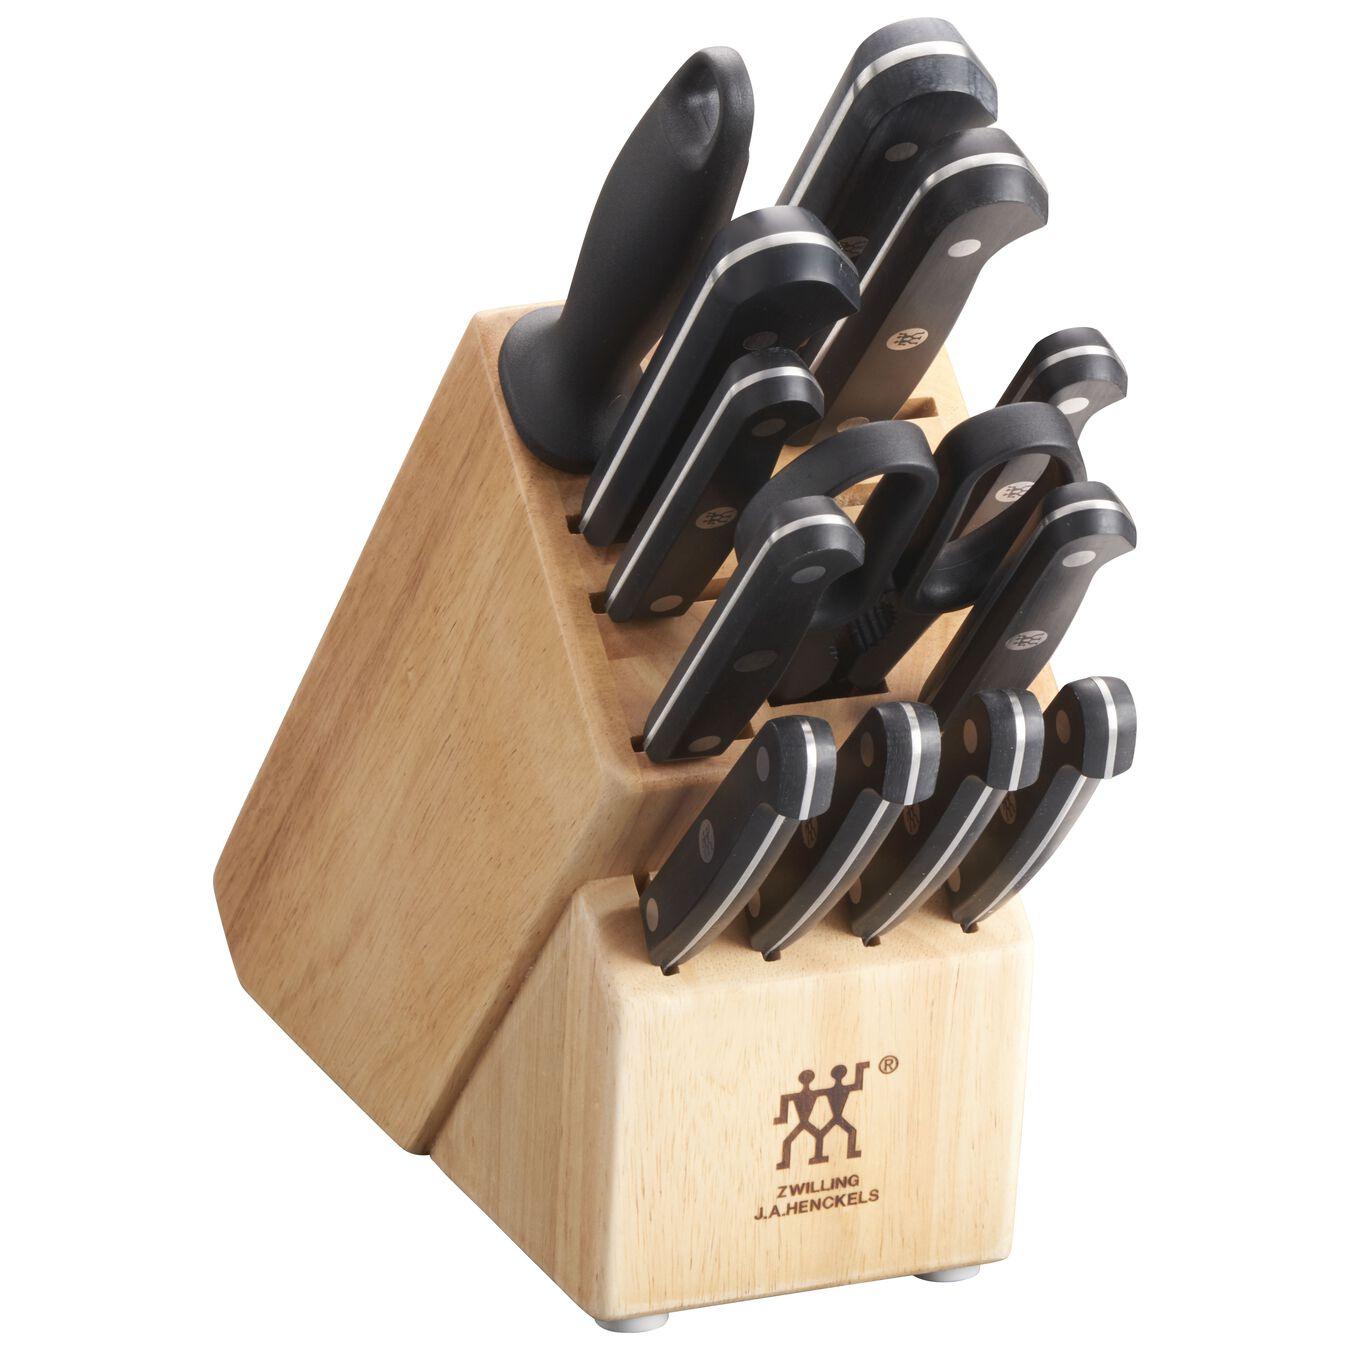 14-pc Knife Block Set,,large 1